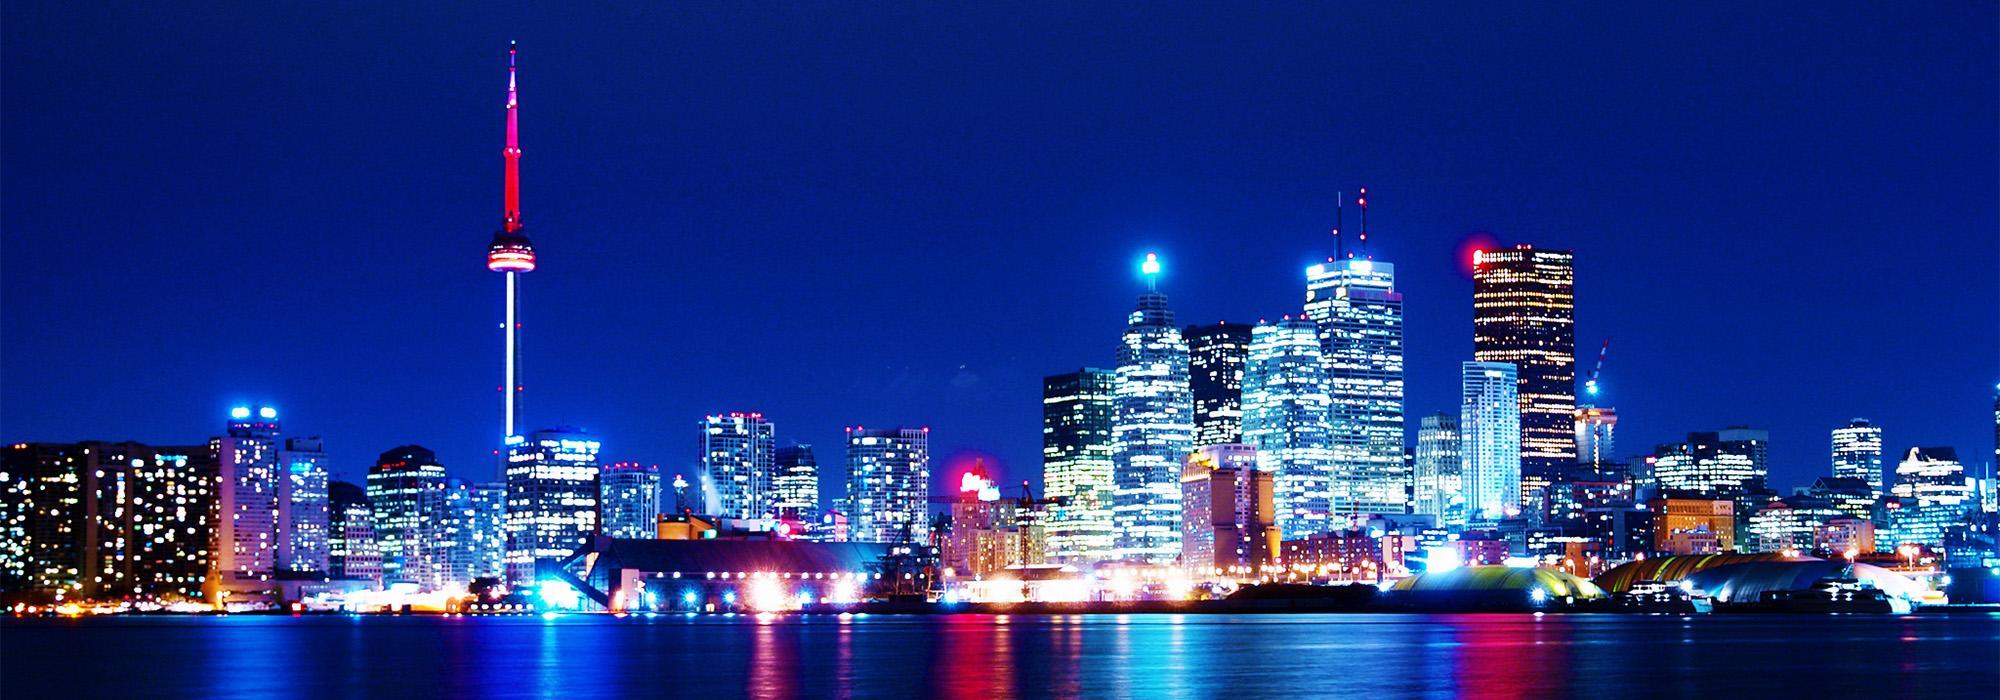 TorontoSkyline_PaulBica_hero.jpg